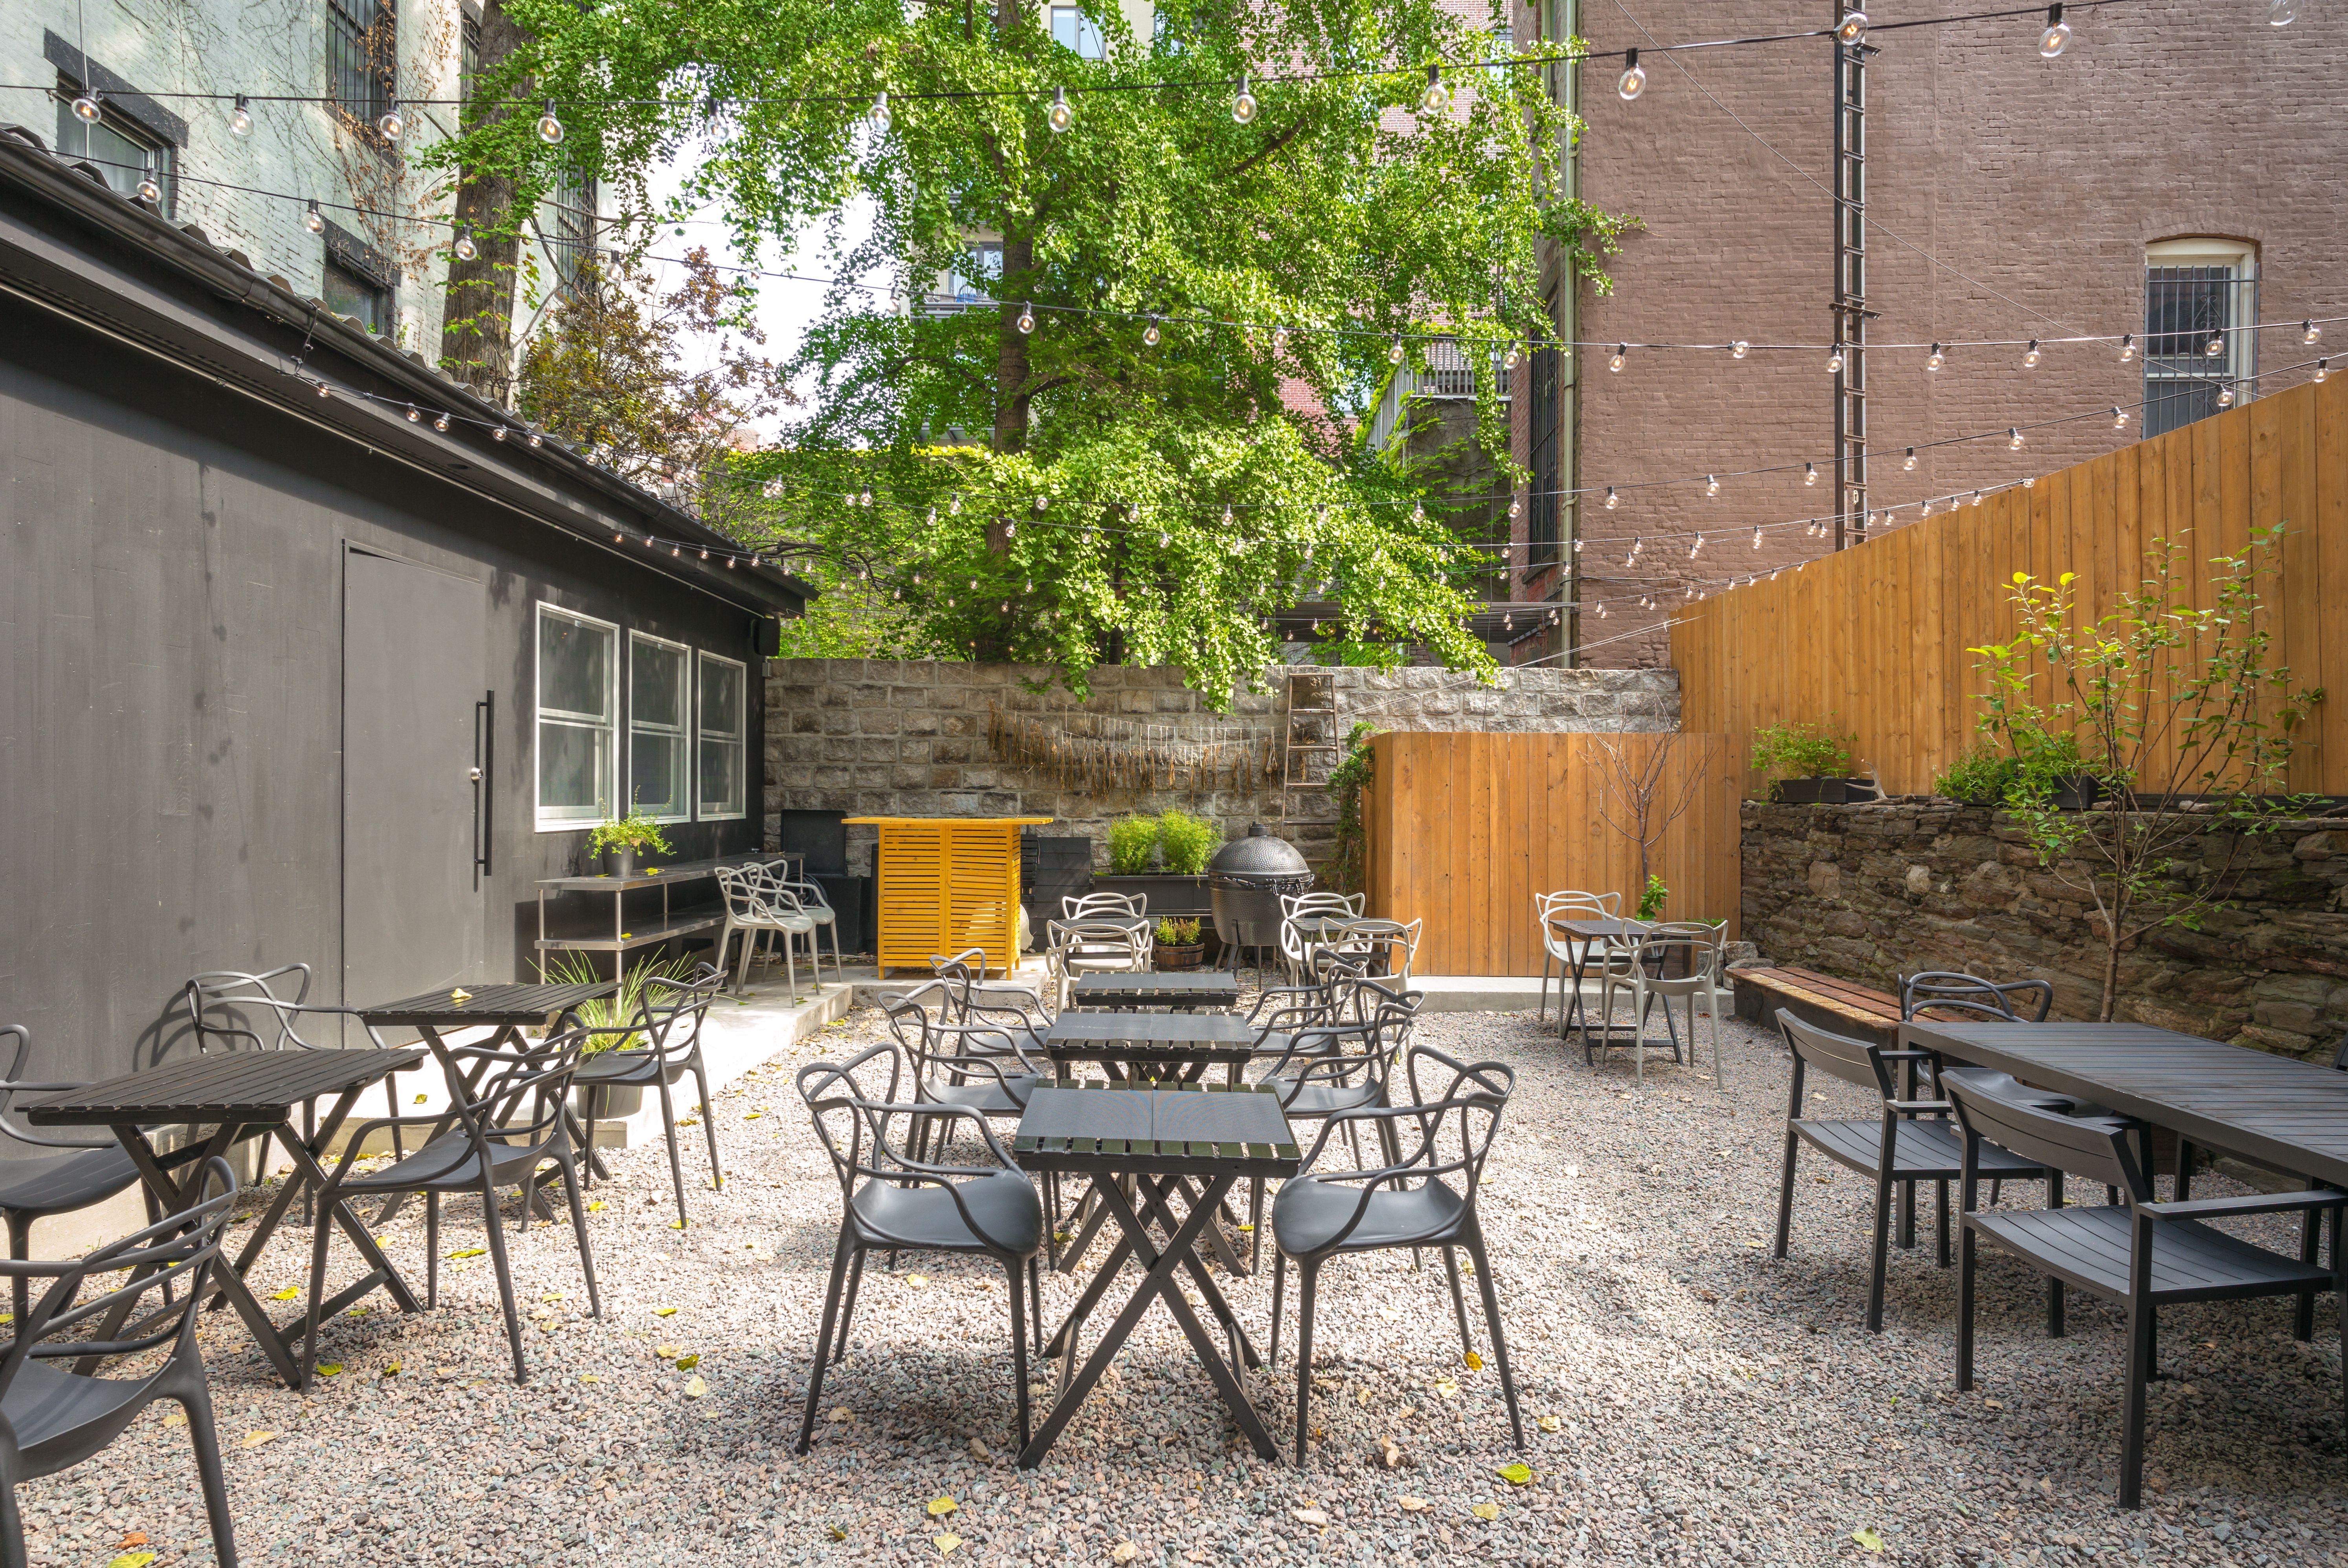 aska is reborn as a spacious tasting menu restaurant with a garden